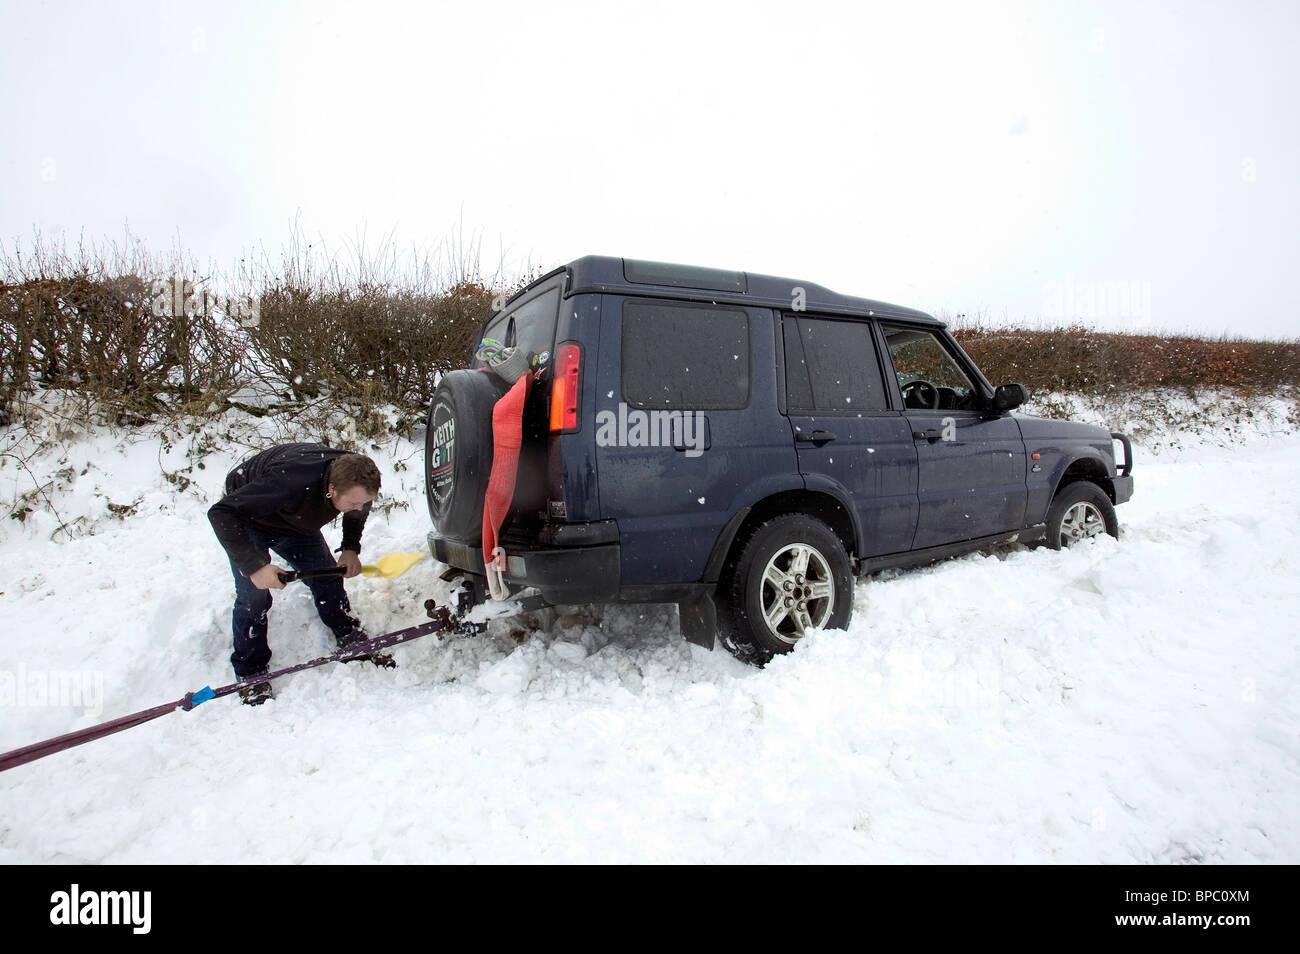 Man digging out snowed in four-wheel drive, Dartmoor, Devon - Stock Image